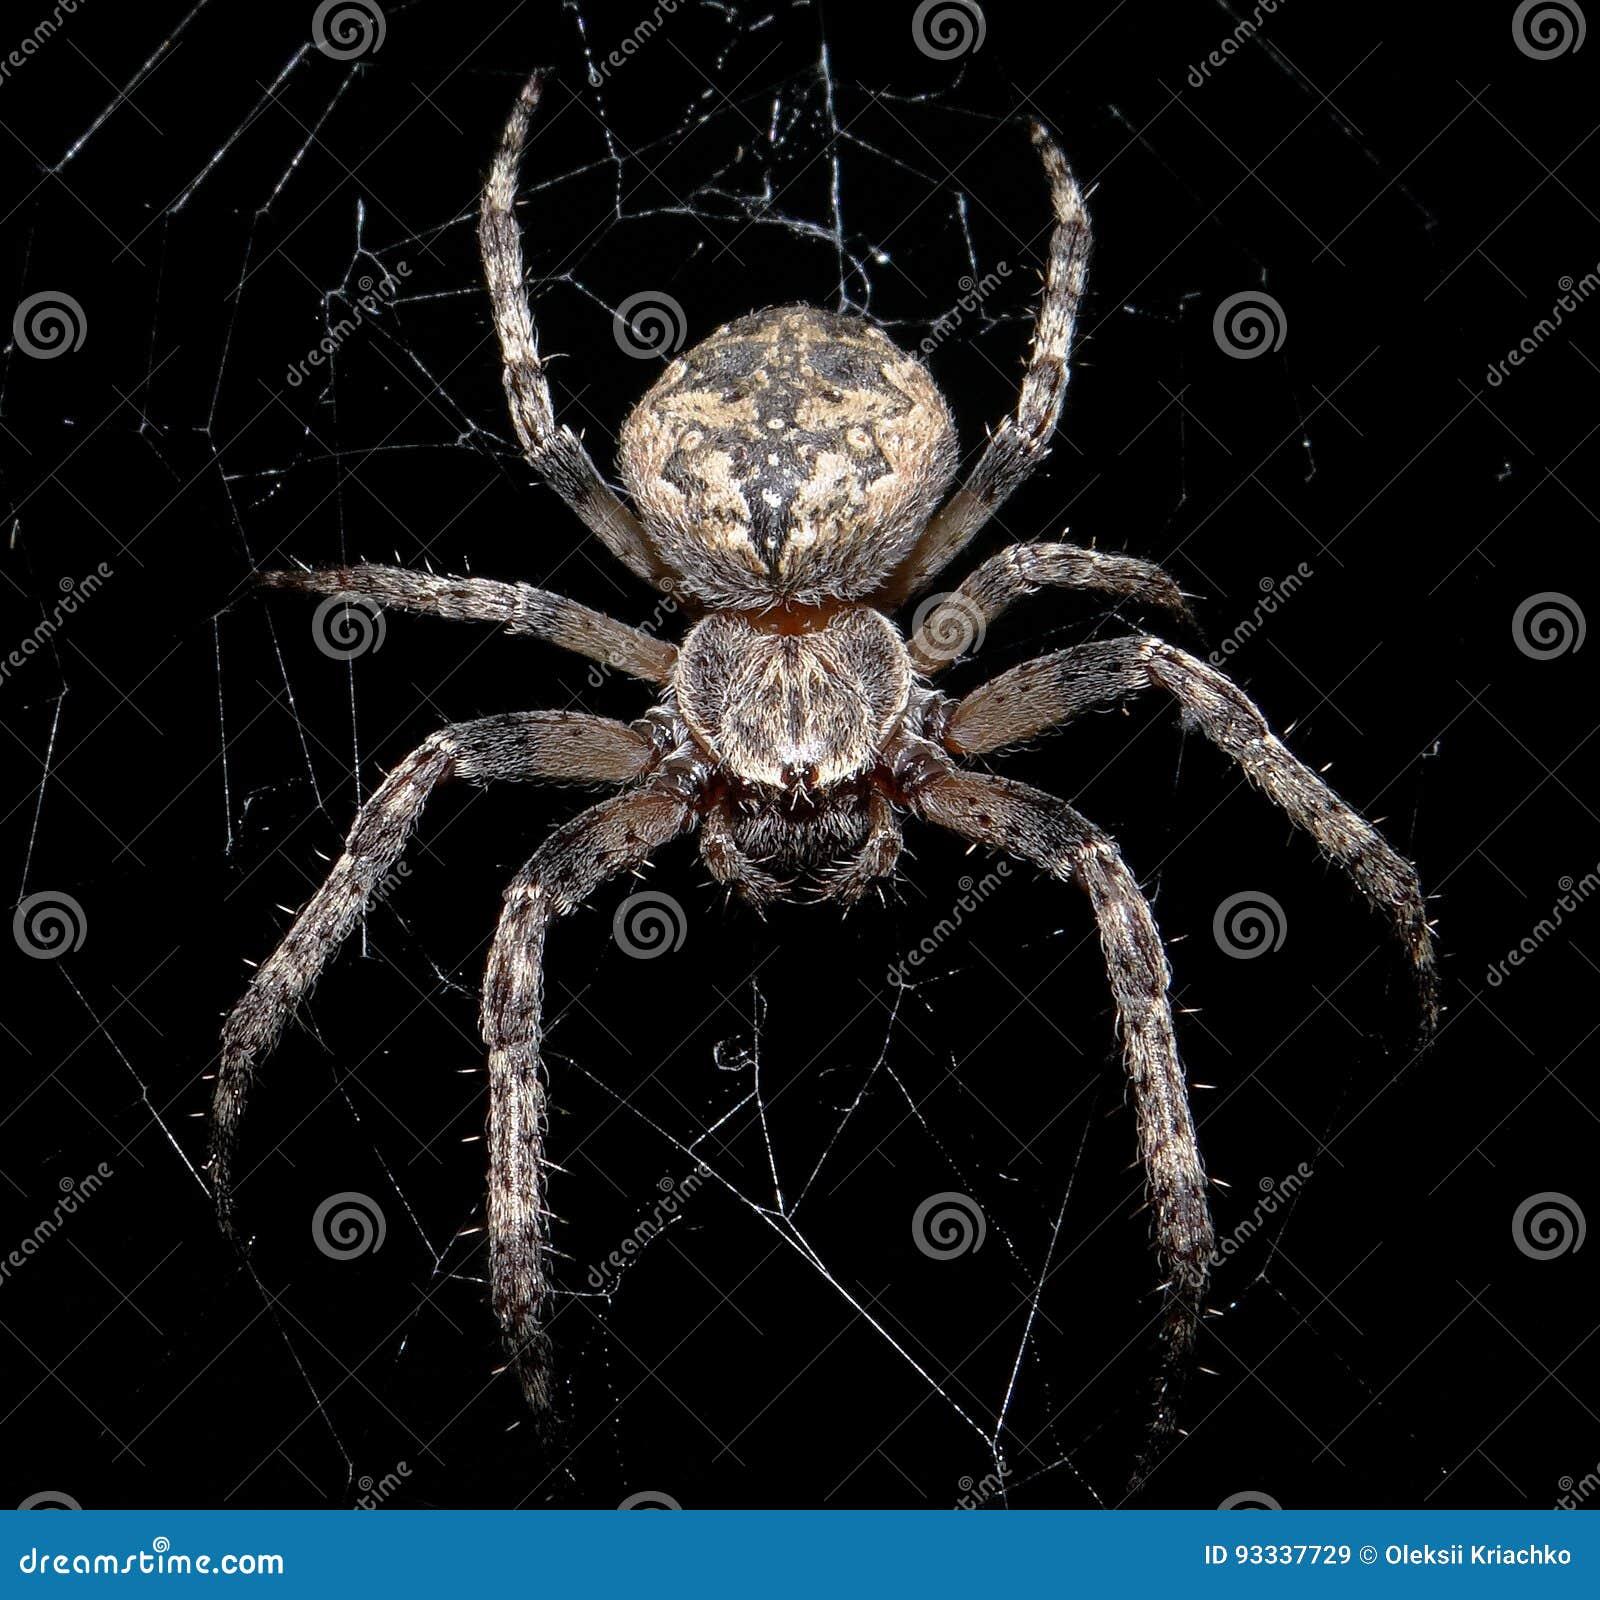 Download Spider stock image. Image of arachnids, snare, victim - 93337729